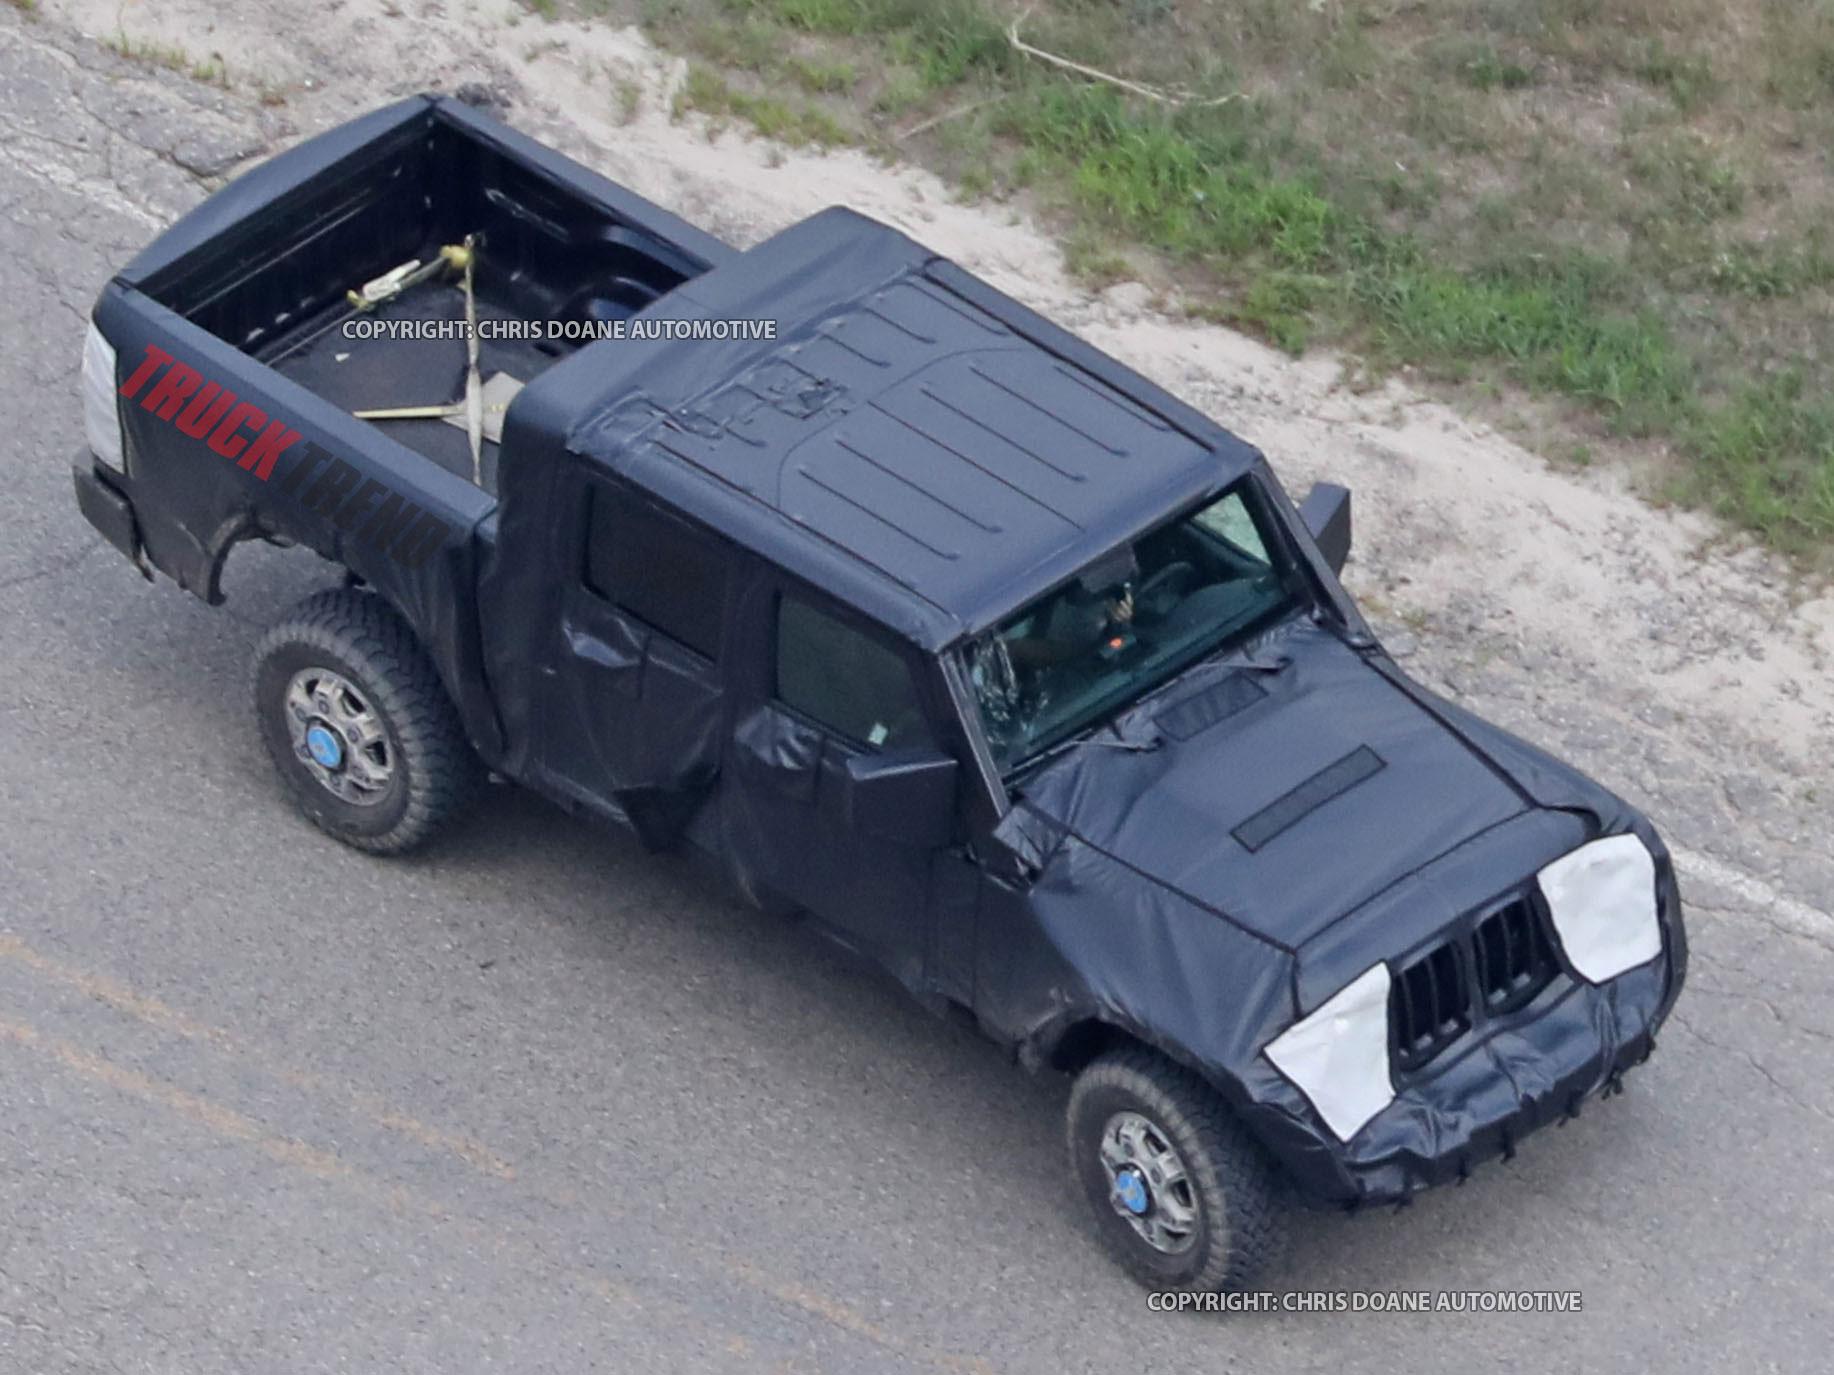 2019 Jeep Wrangler JL Pickup Spyshots 02